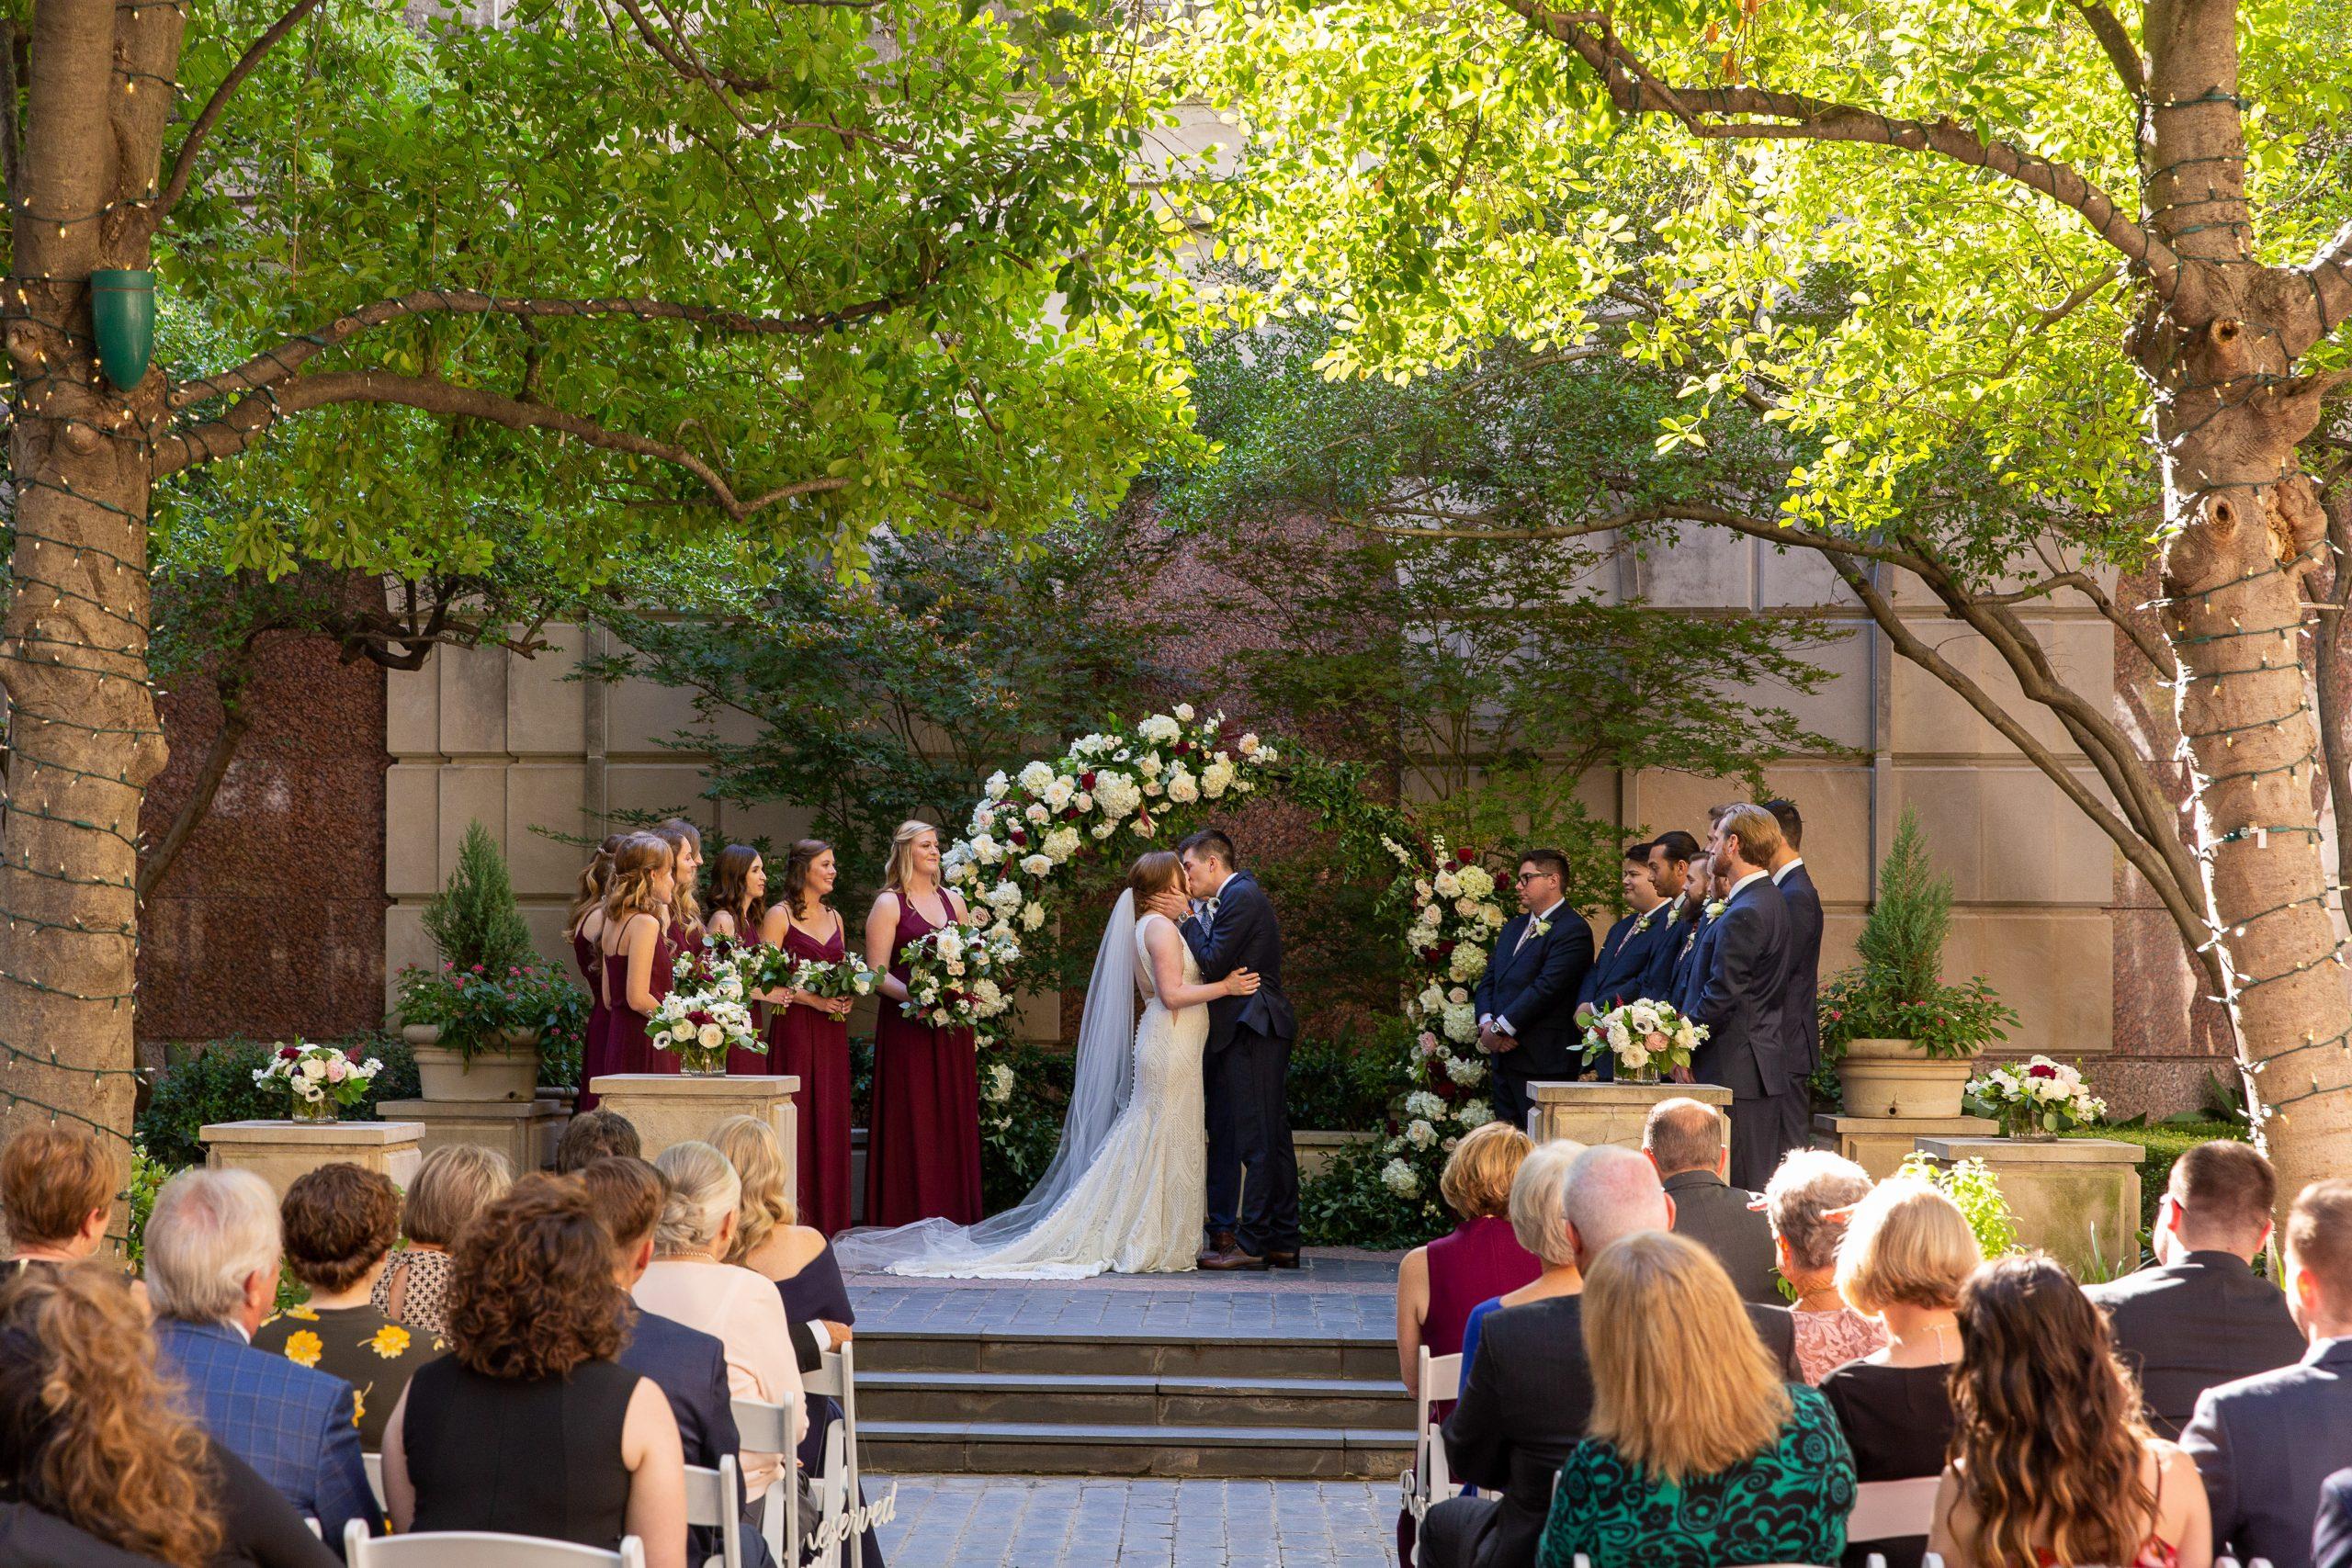 Kiley Wedding - DCM Photo - Ceremony3